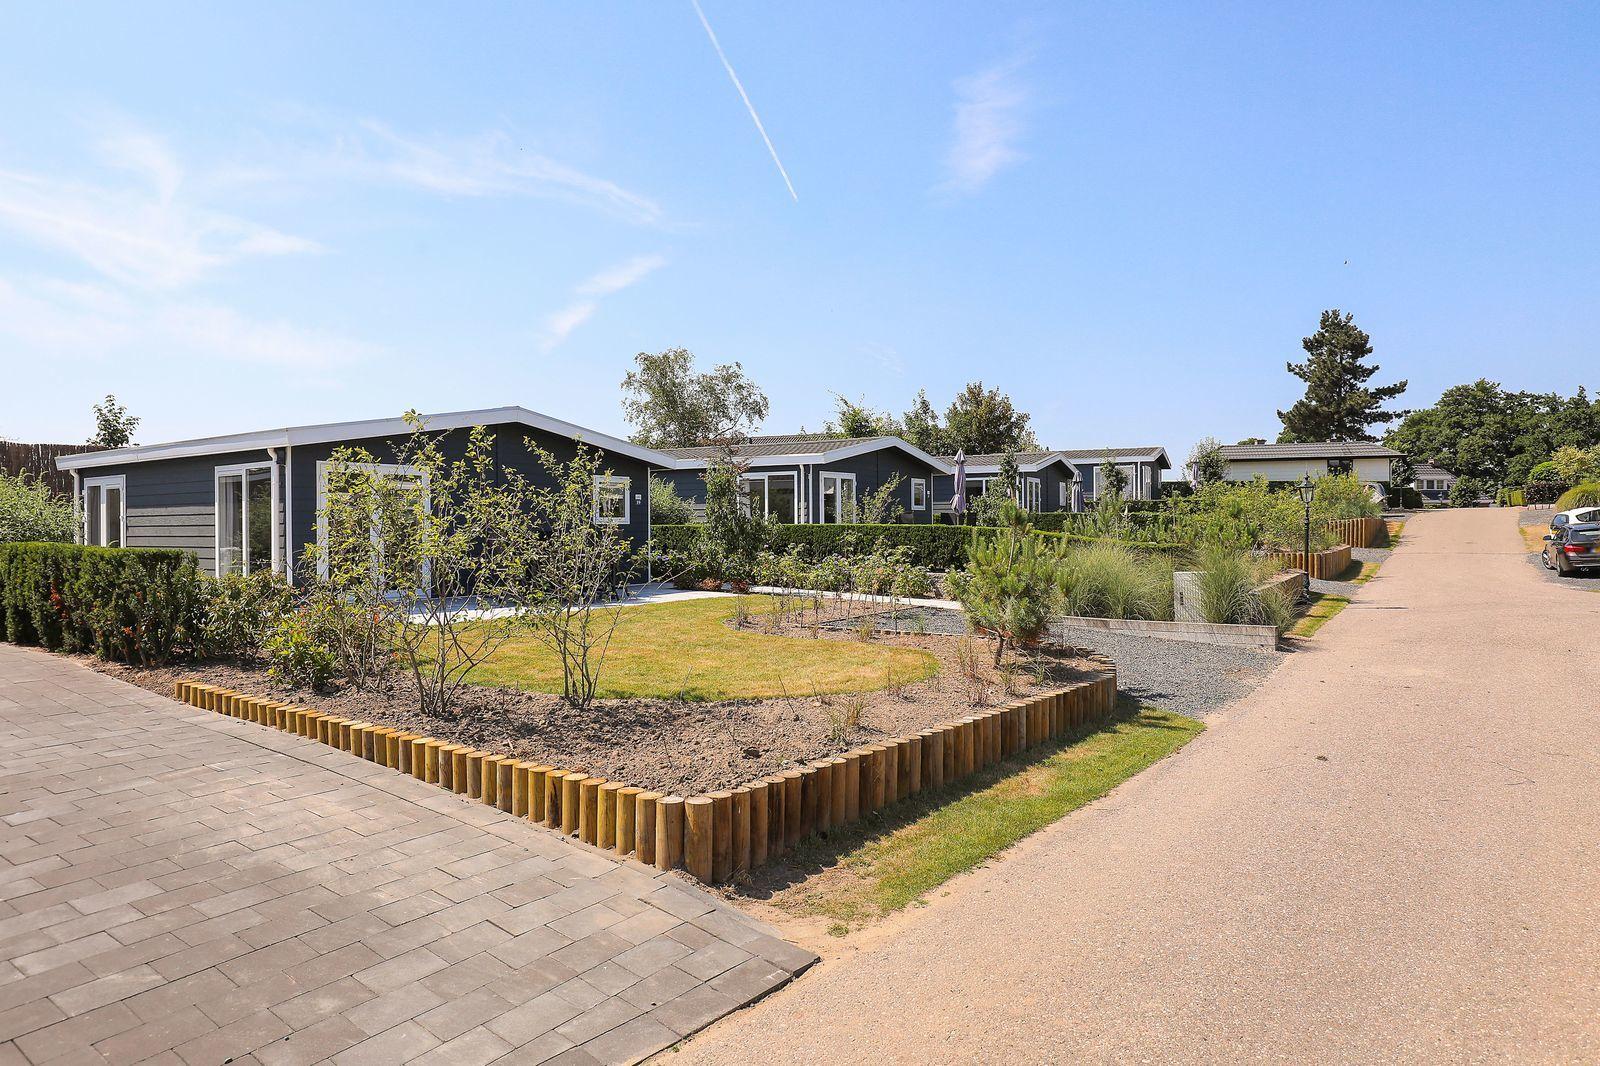 Strandhuis Ferienhaus am Veluvermeer